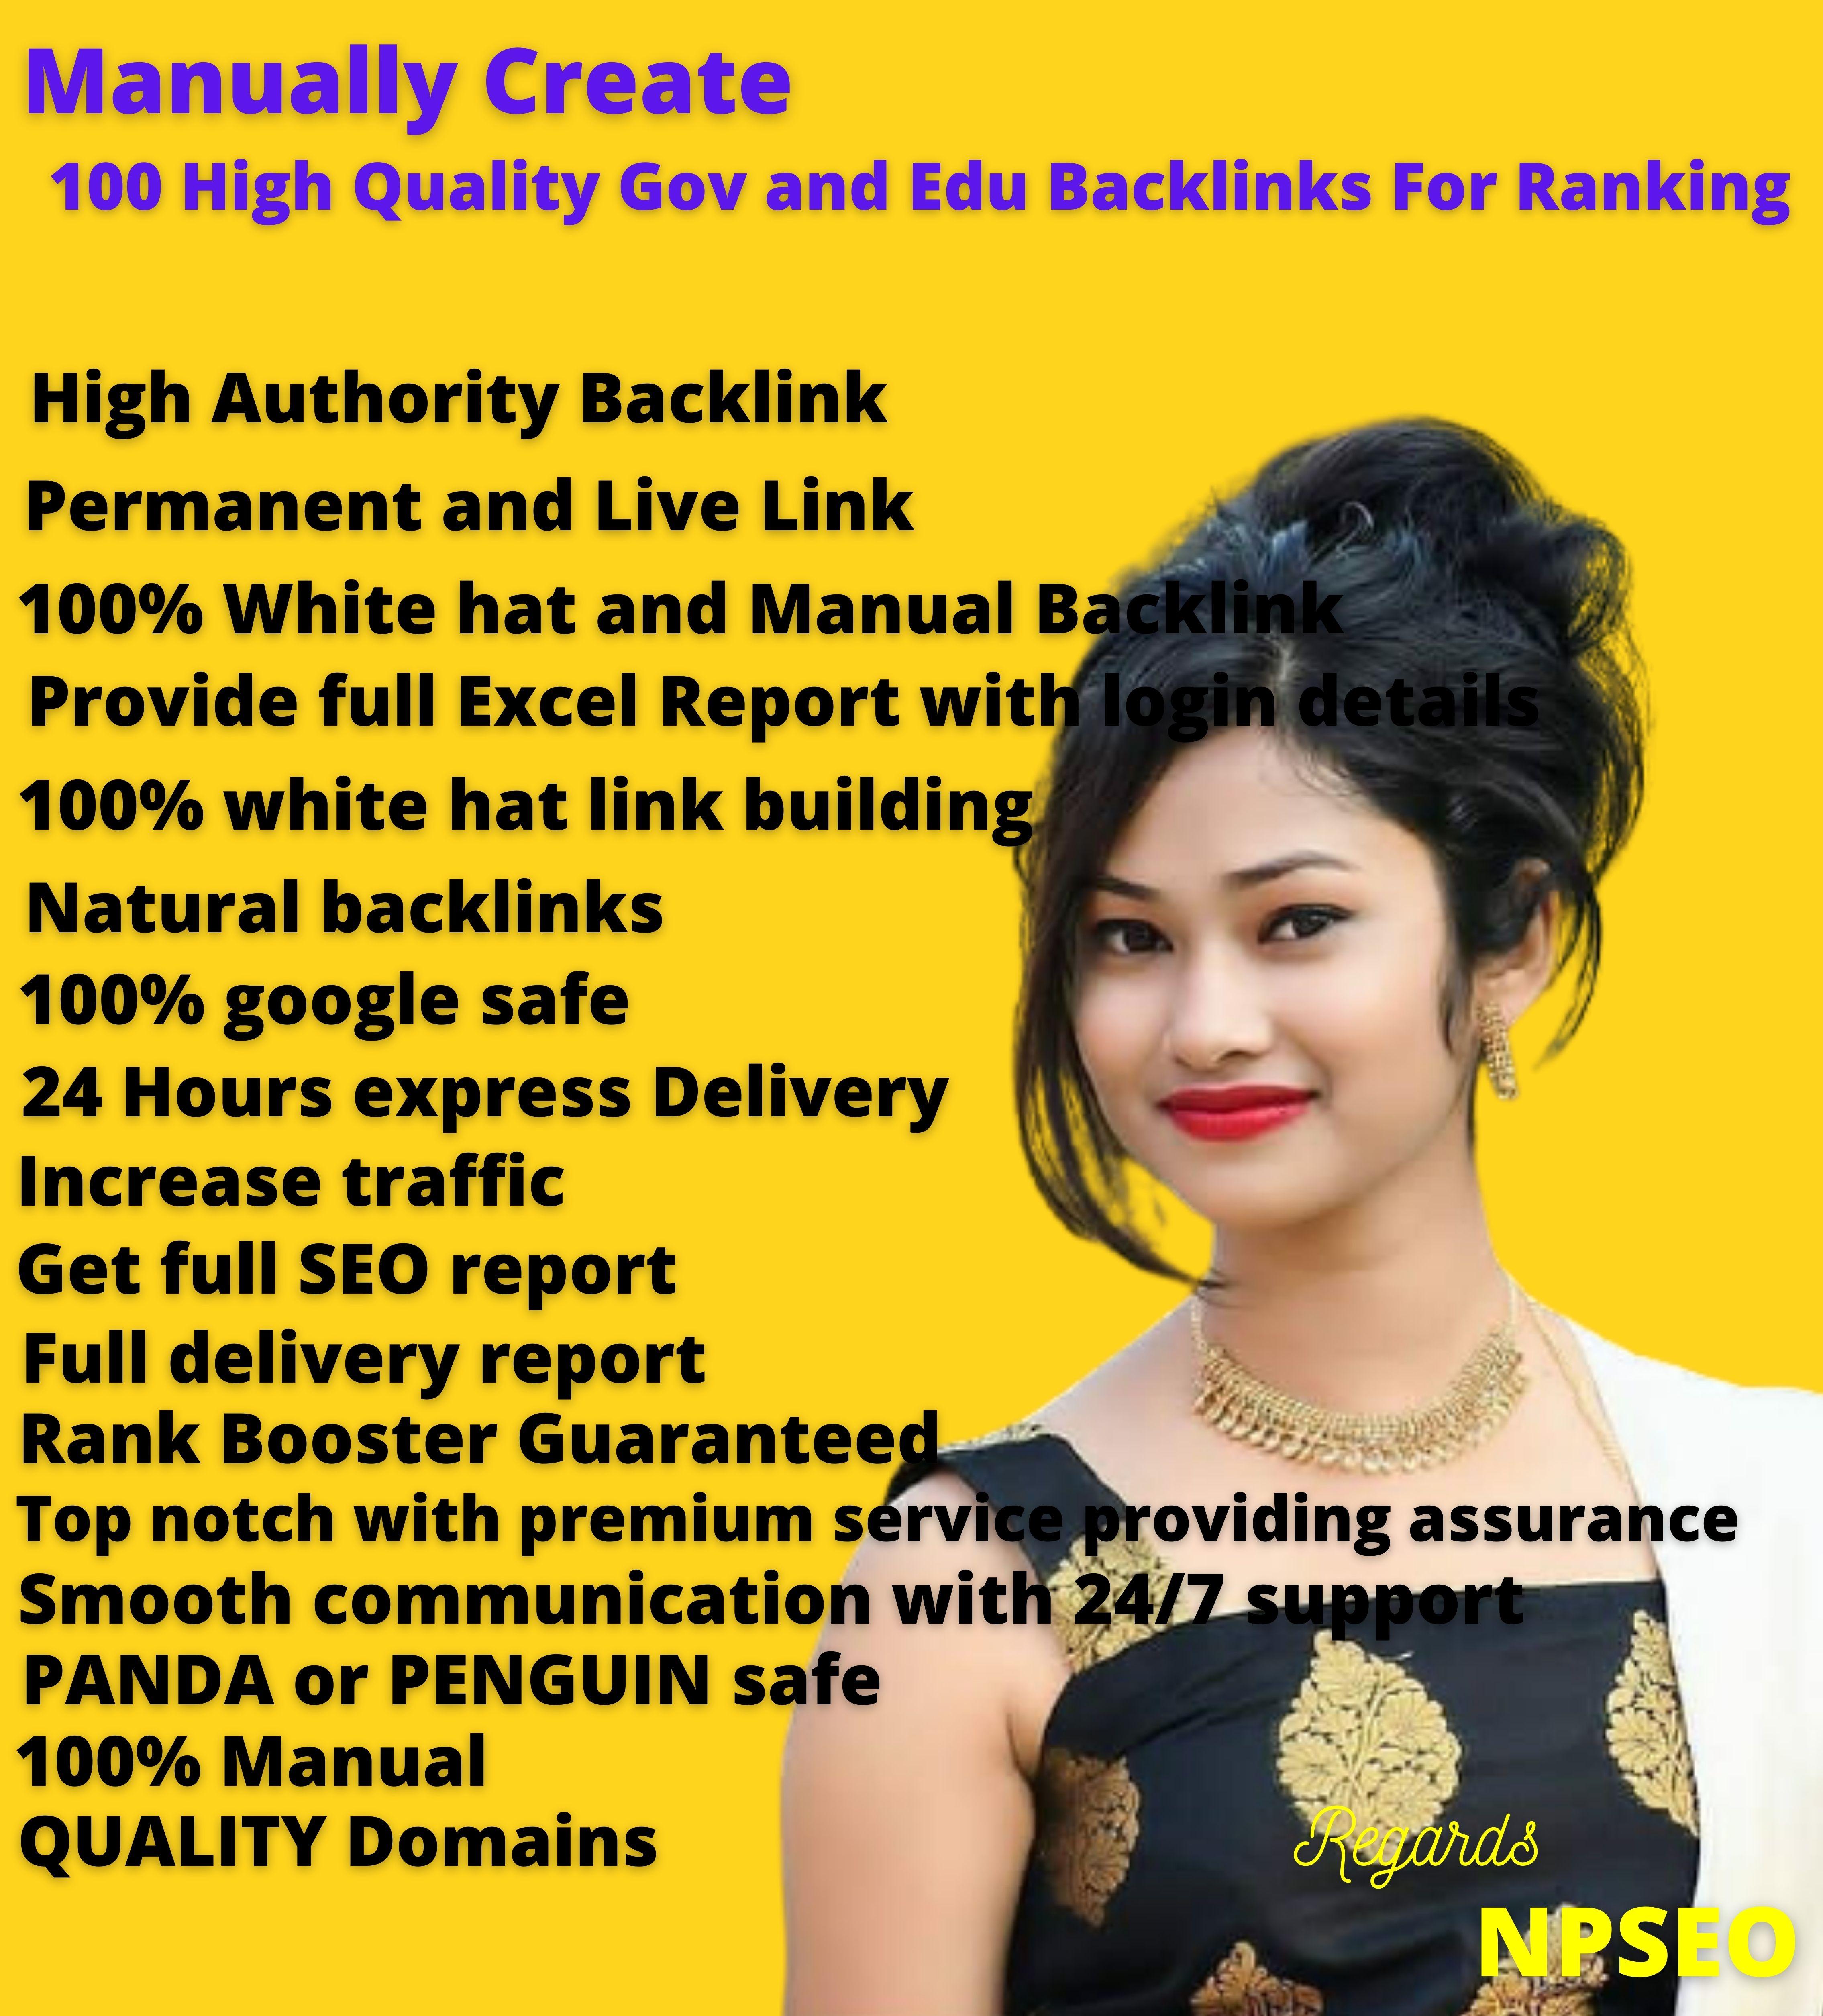 Manually Create 100 High Quality Gov and Edu Backlinks For Ranking